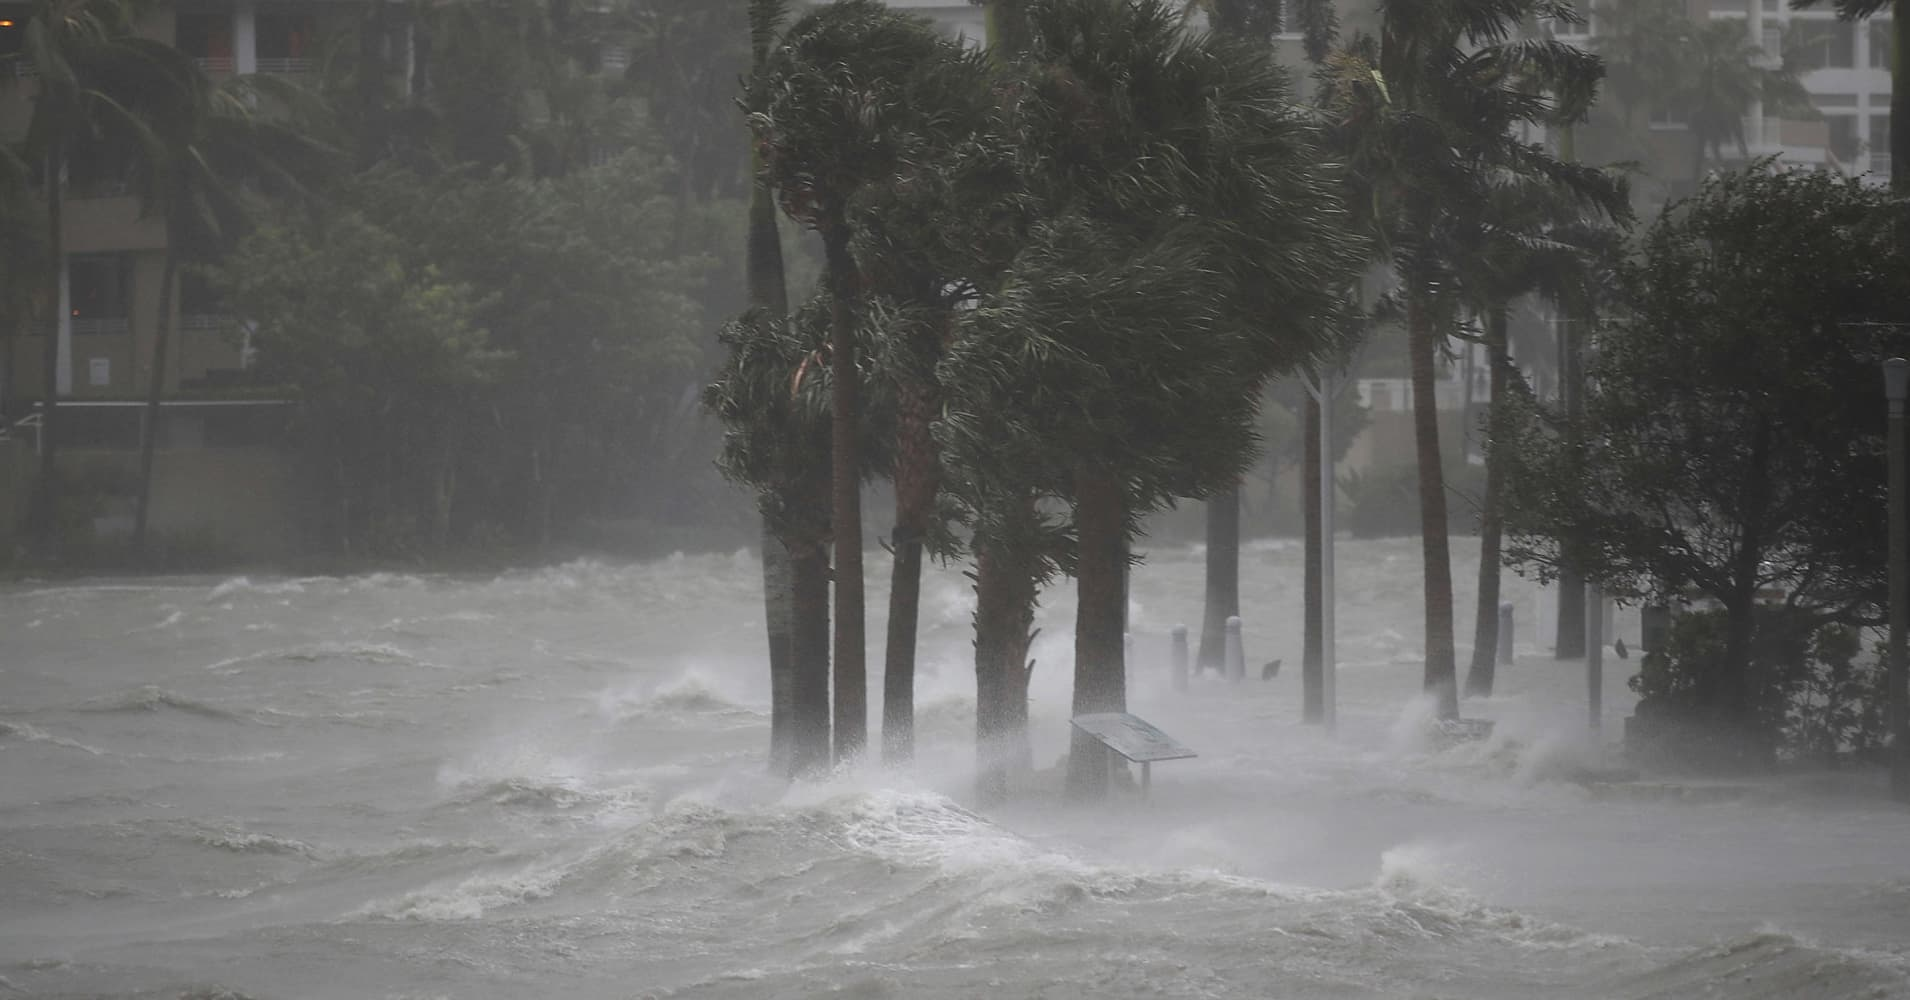 Hurricane Irma wallops Miami, topples second crane, floods streets